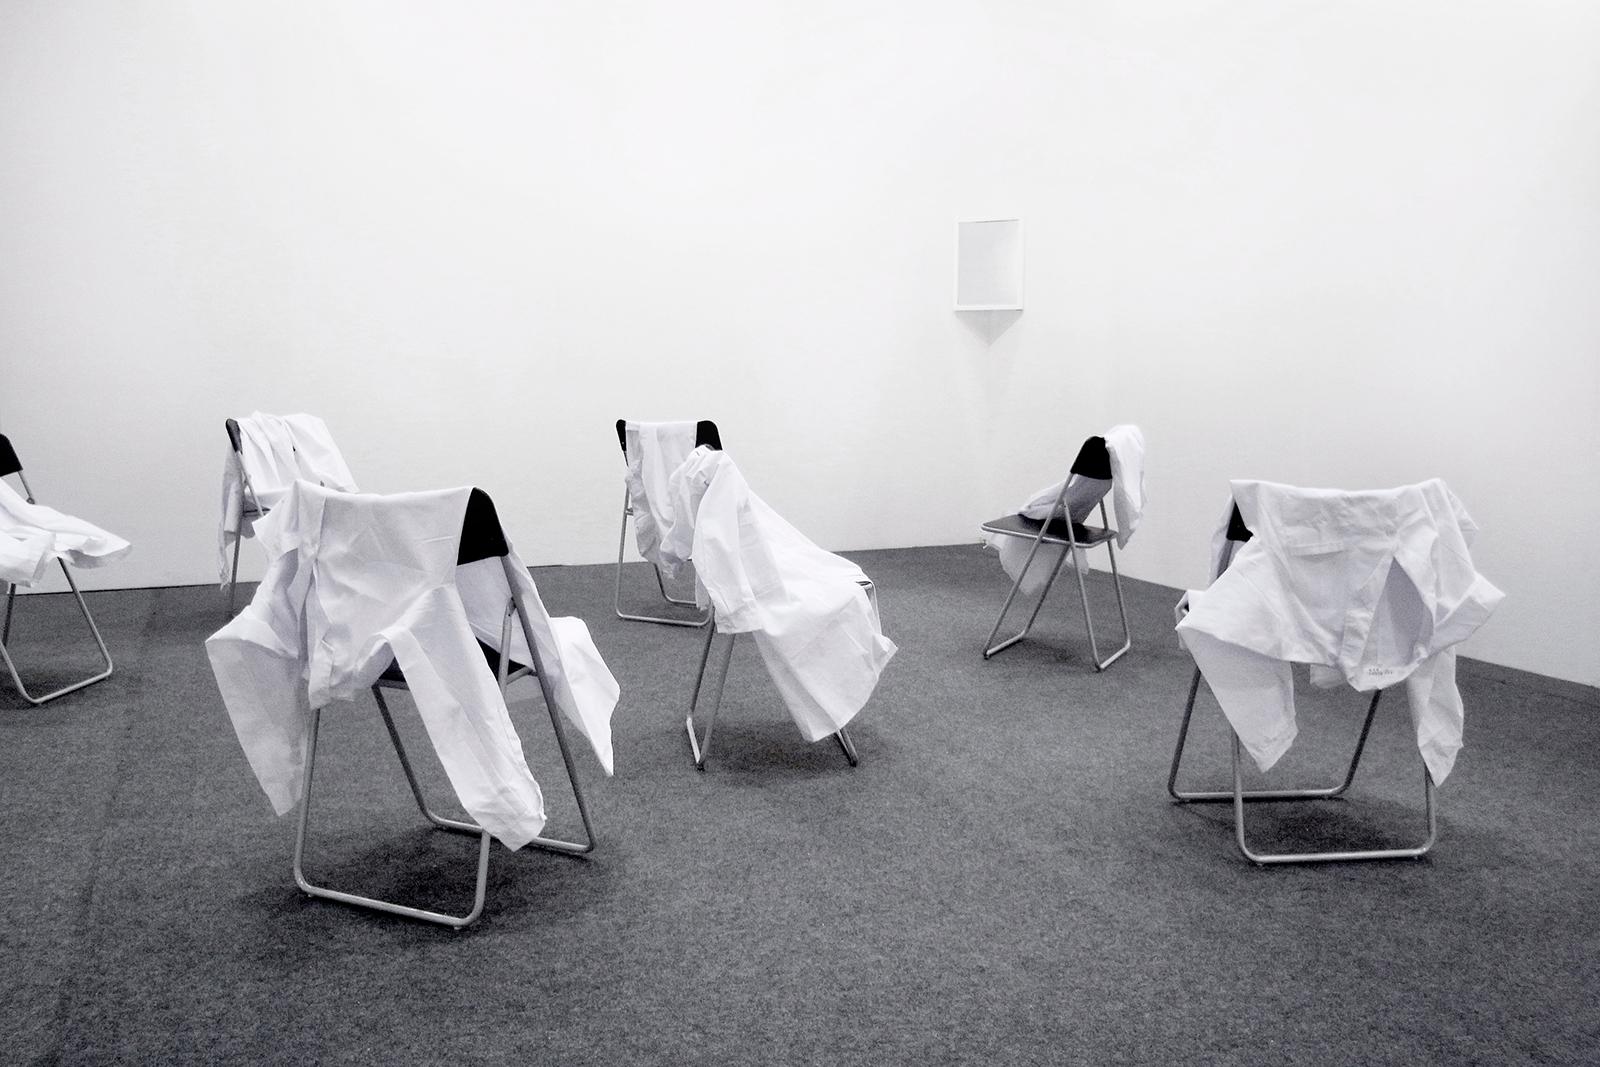 He Must Die , 2010. Installation view, KDJ Convention Center, Gwangju, South Korea, 2010.